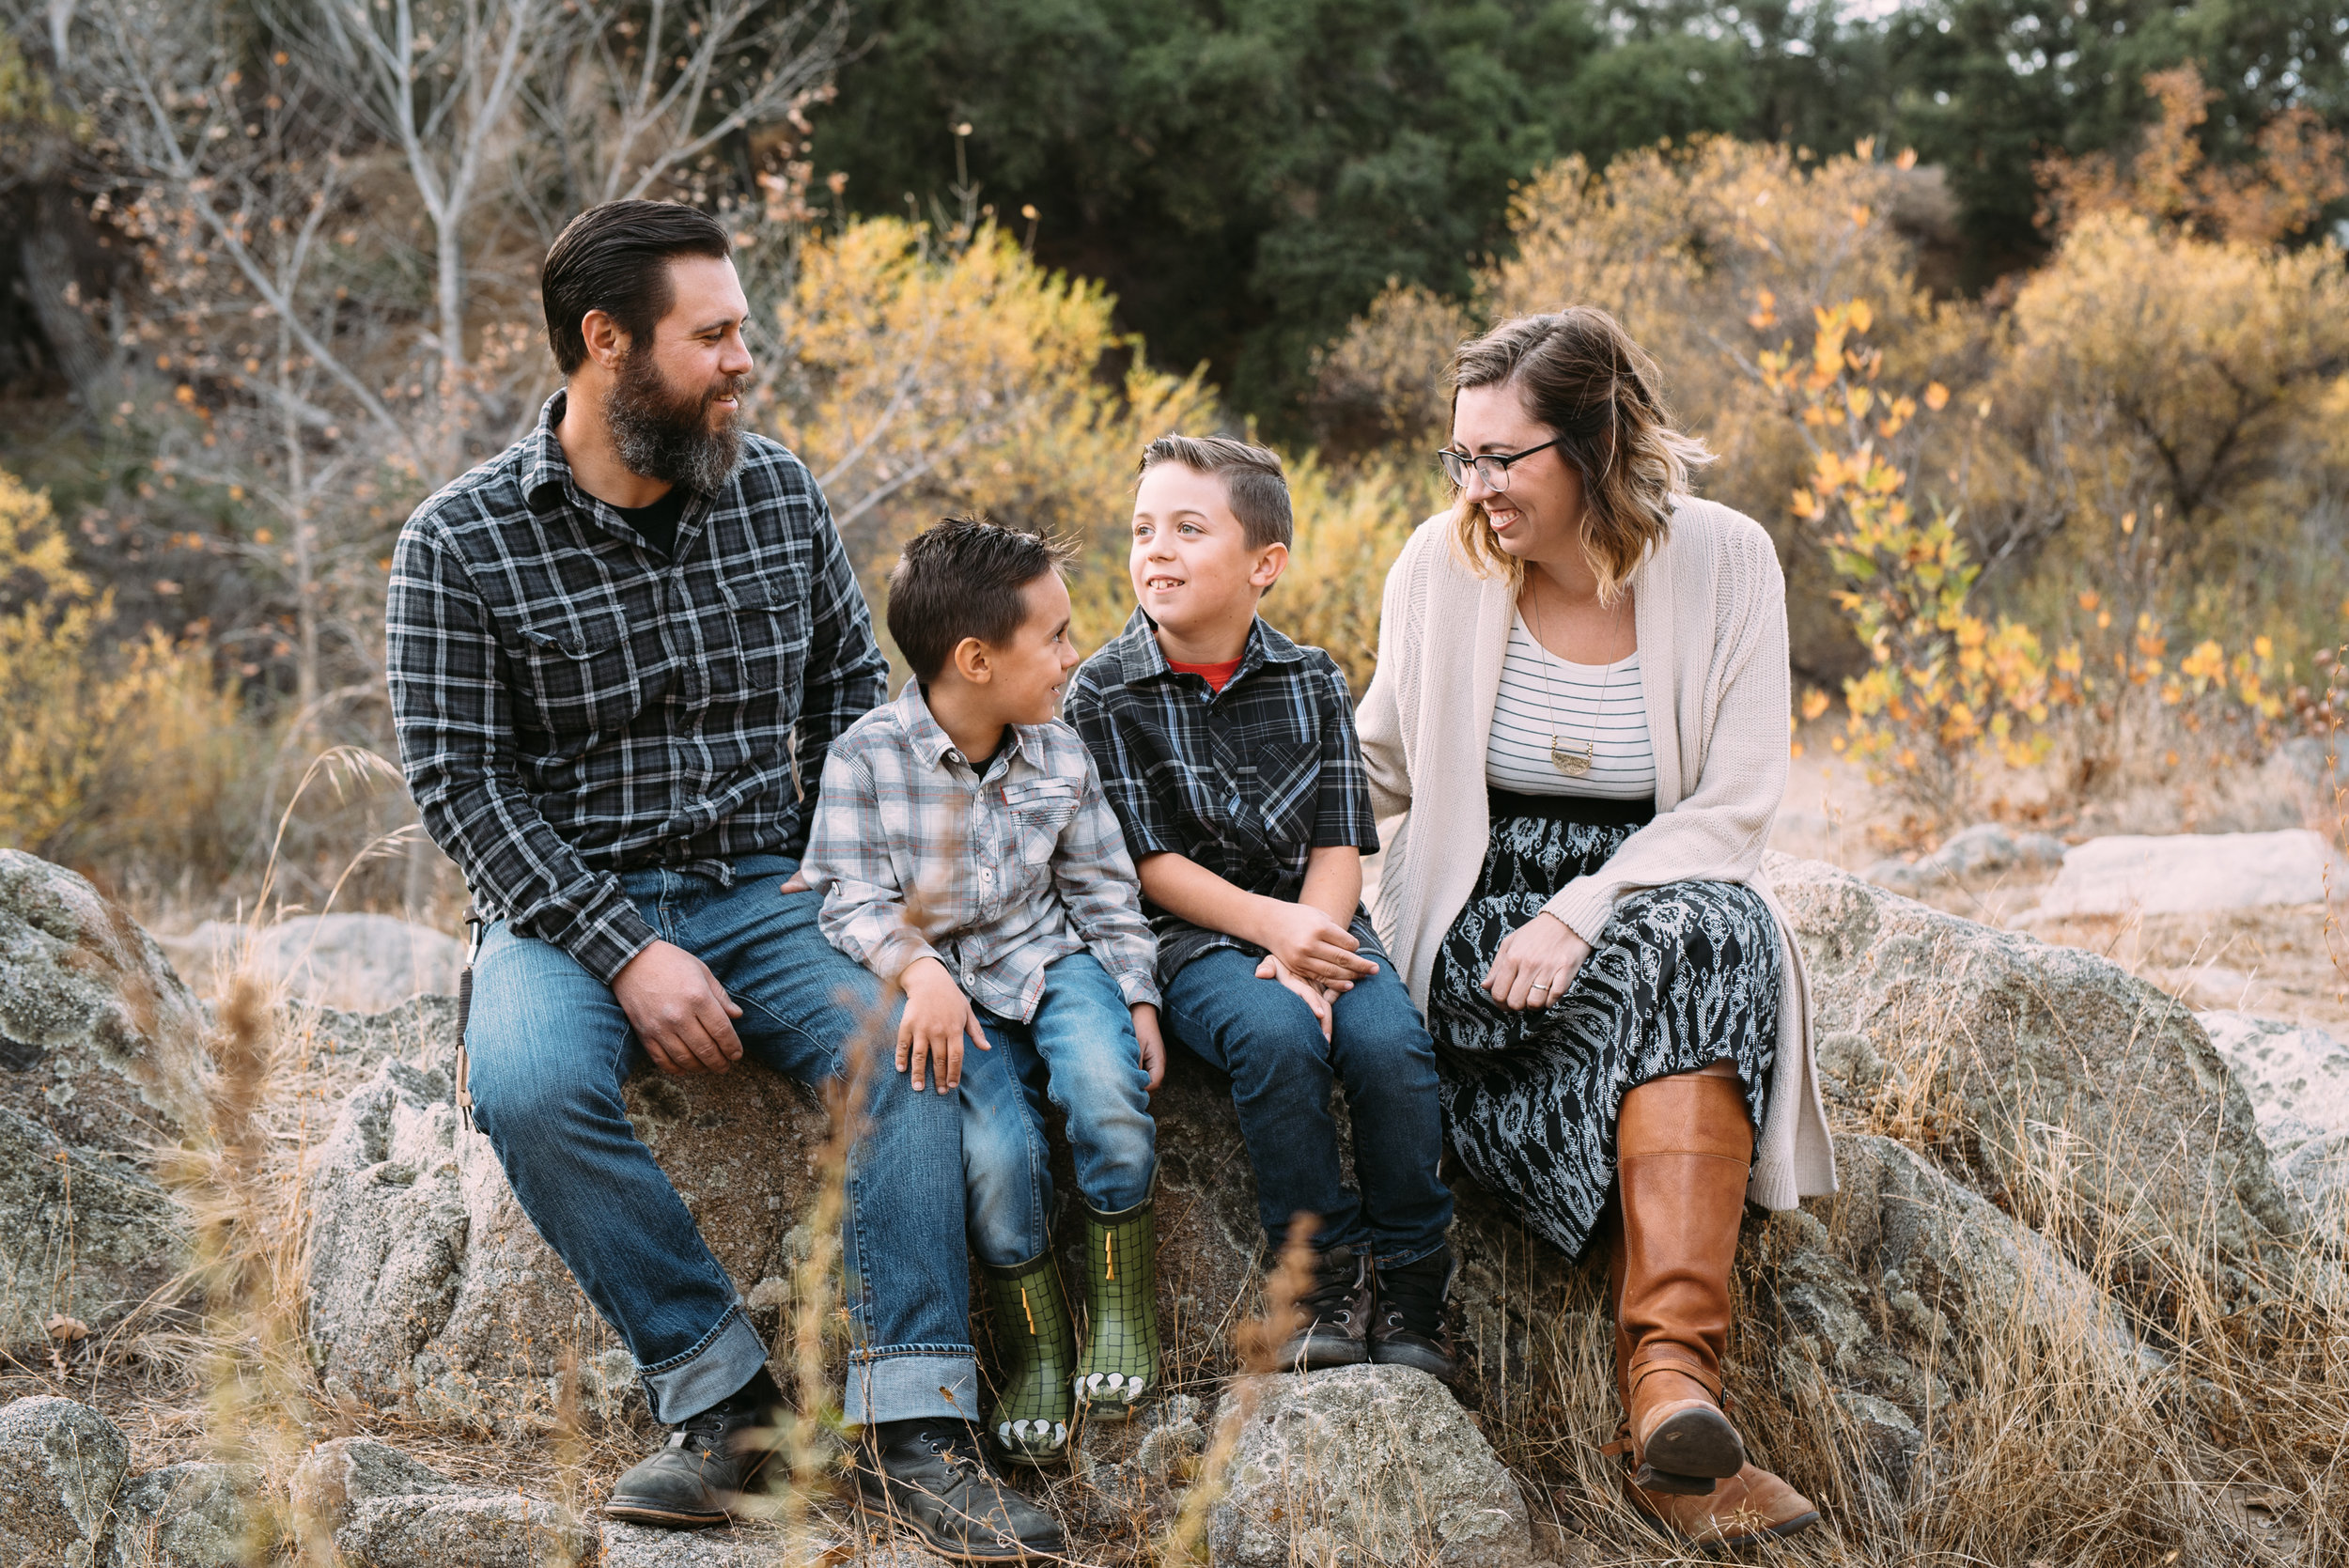 santamargaritafamily-14.jpg